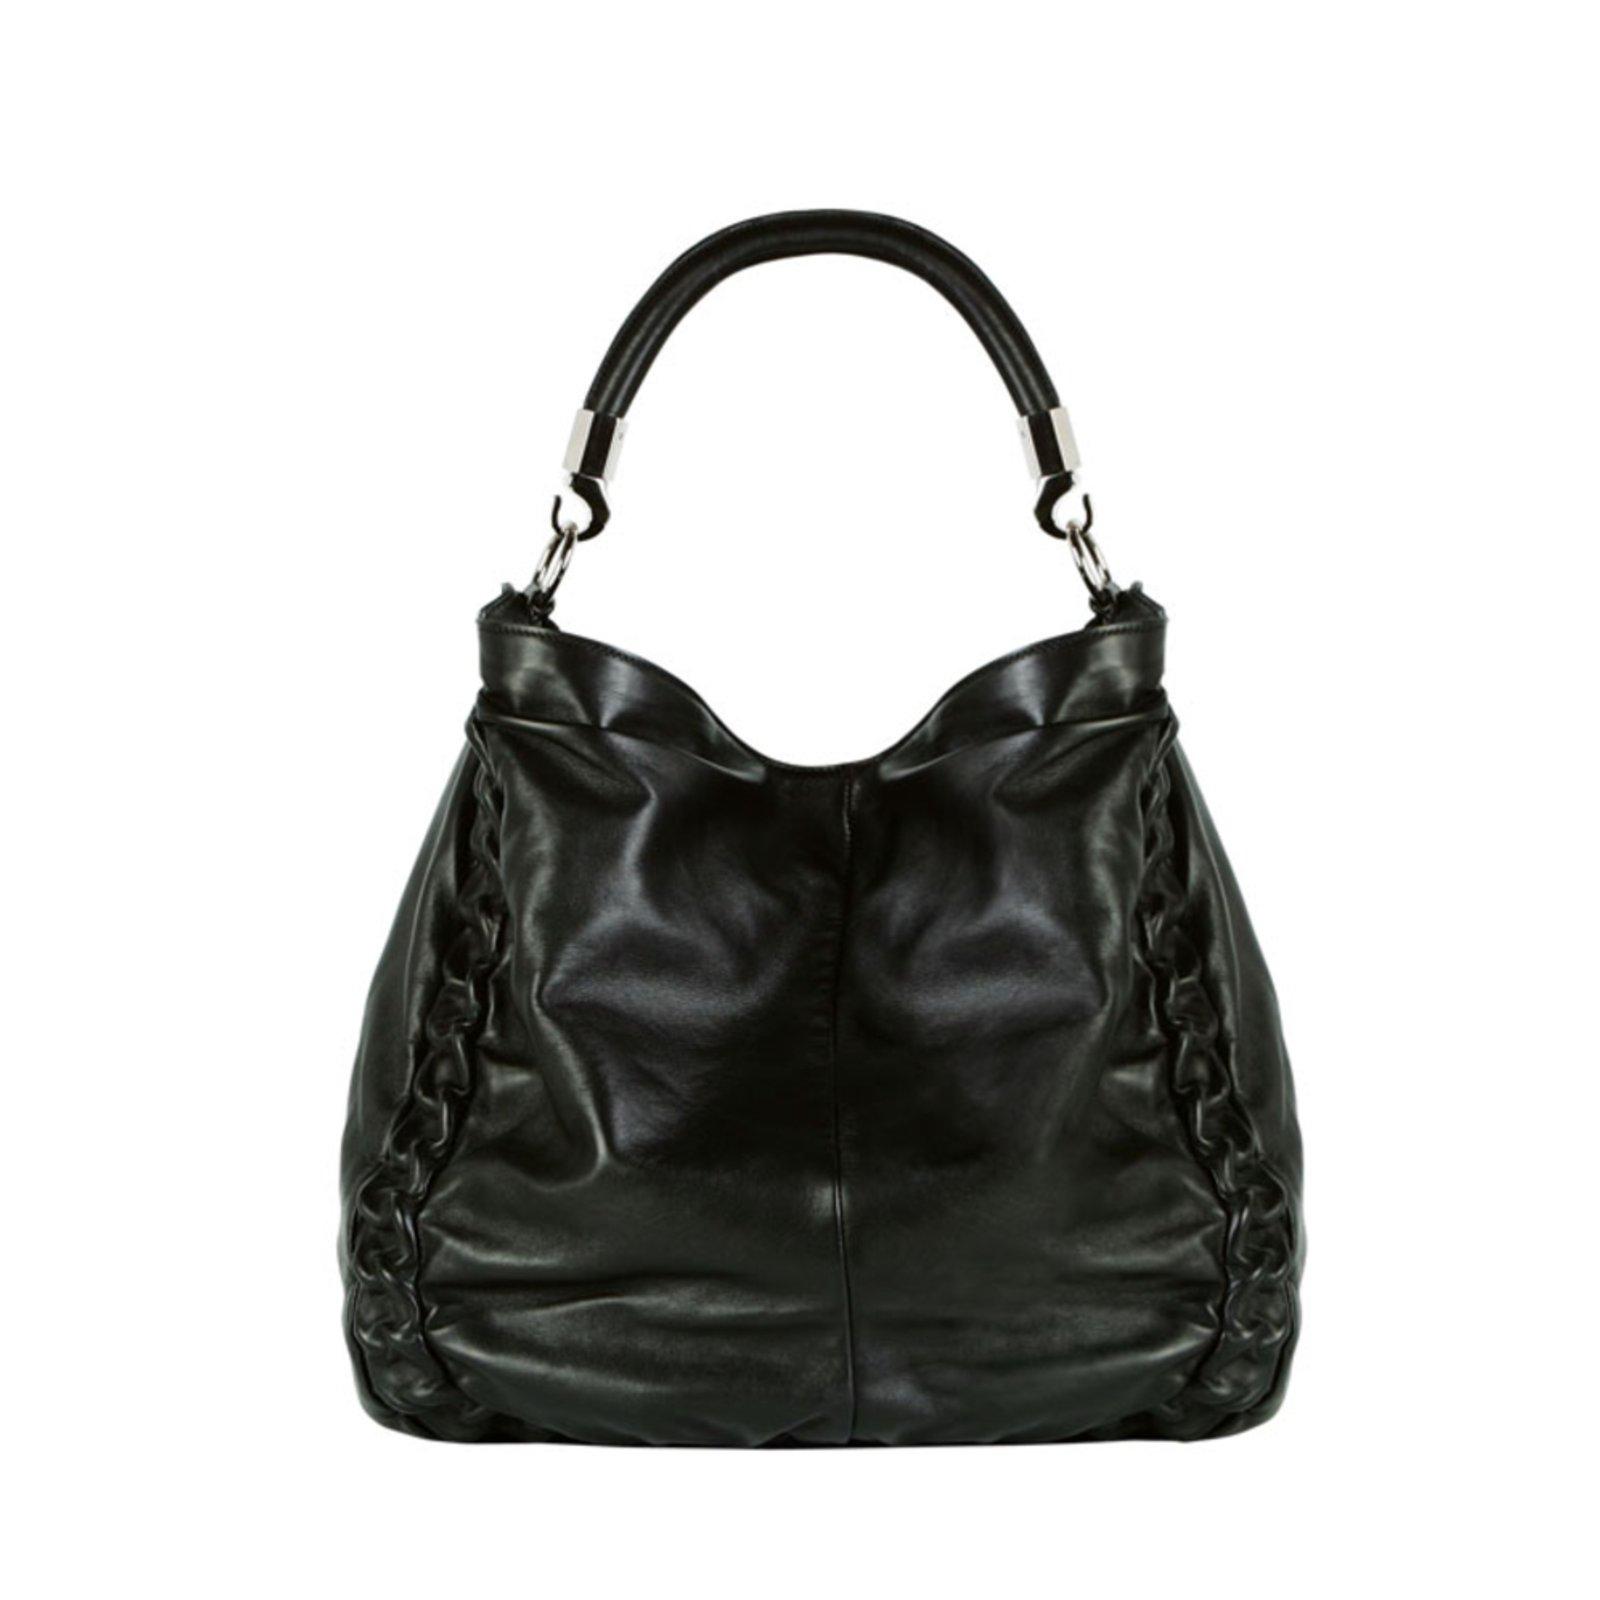 Yves Saint Laurent Handbag Handbags Patent Leather Black Ref 24281